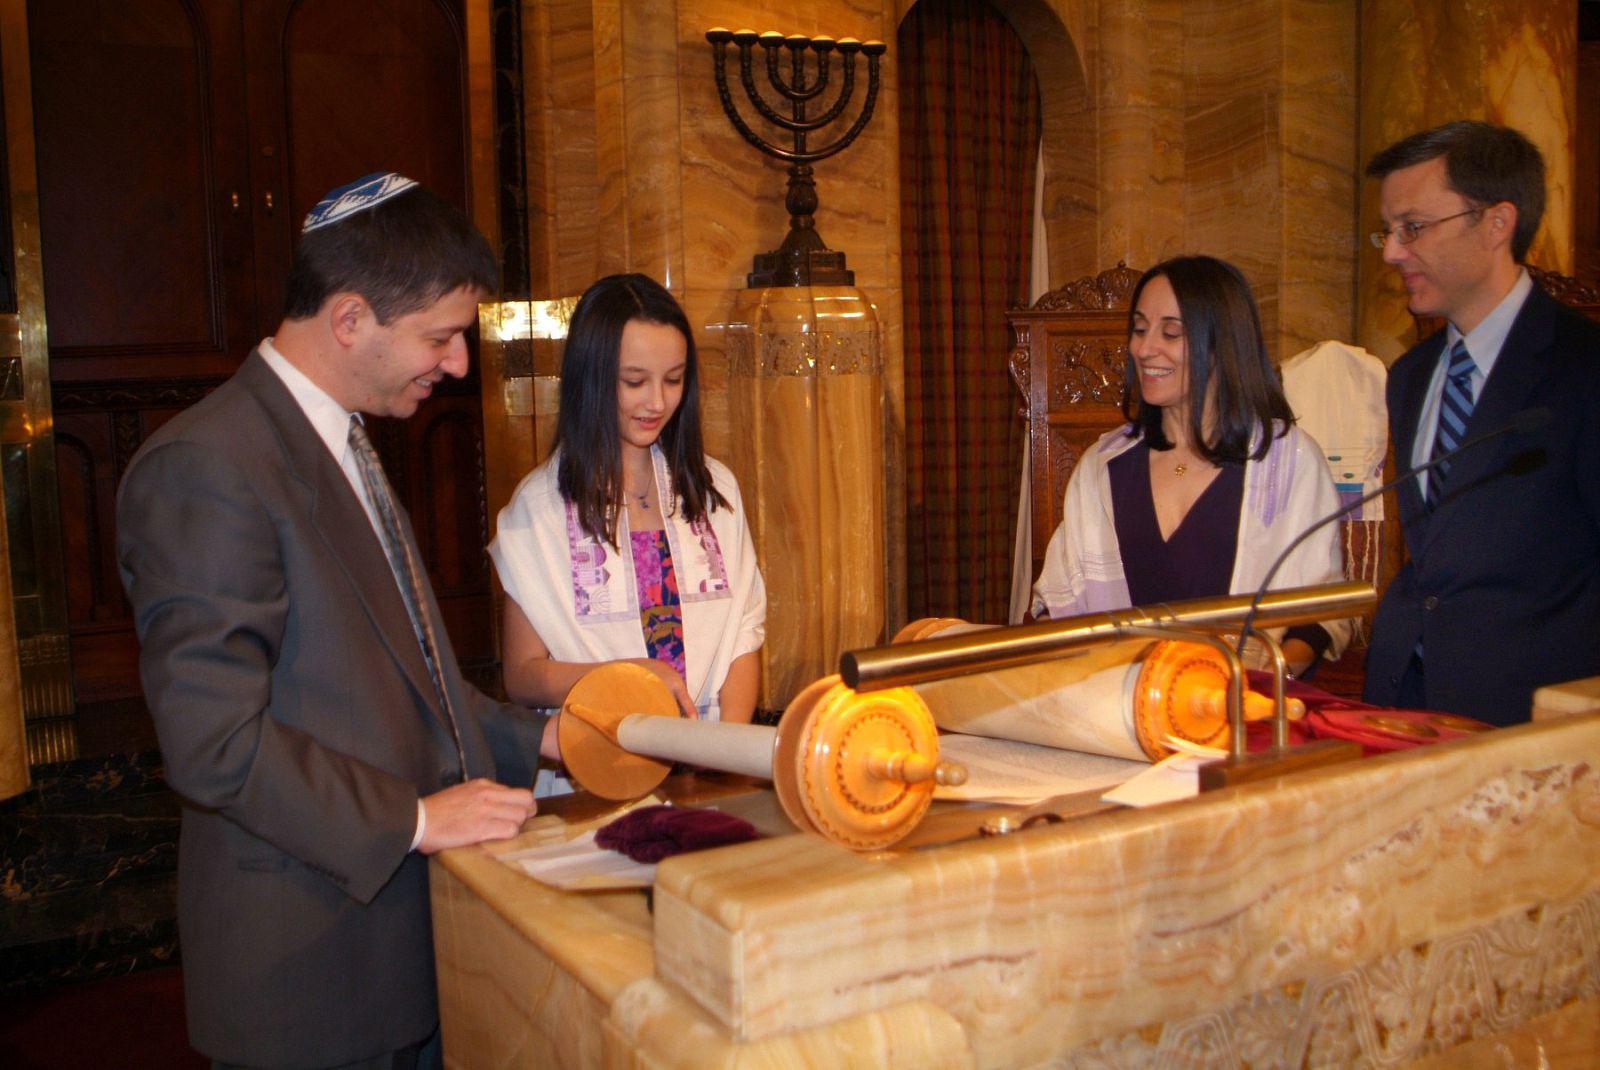 bar and bat mitzvahs October 24th, 2015 | annabella kliman bat mitzvah october 10th, 2015 | talia friedman bat mitzvah august 29th, 2015 | samantha & ryan smith bat & bar mitzvah.